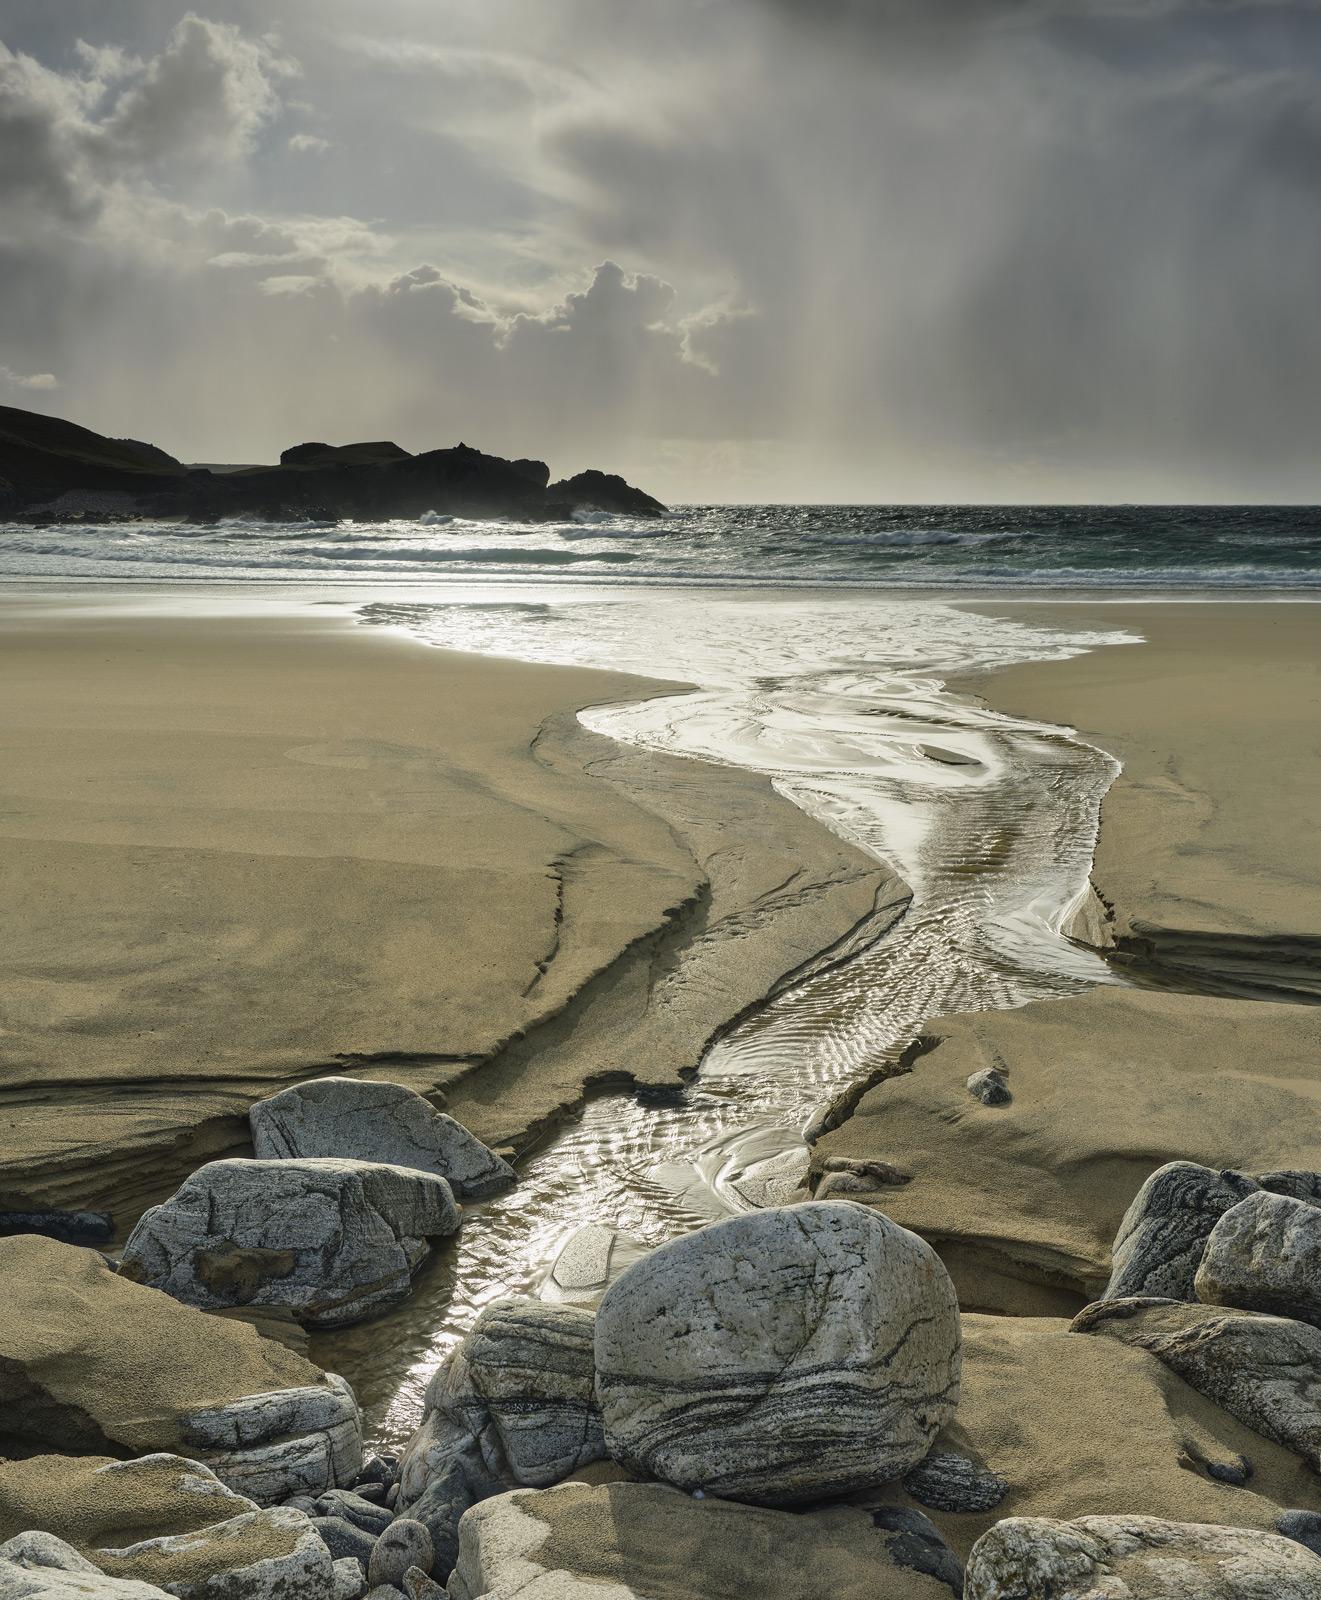 Storm Front Mangerstadh Beach, Mangerstadh Beach Lewis, Scotland, gorgeous, sharp, showers, drenching, gneiss, stream , photo